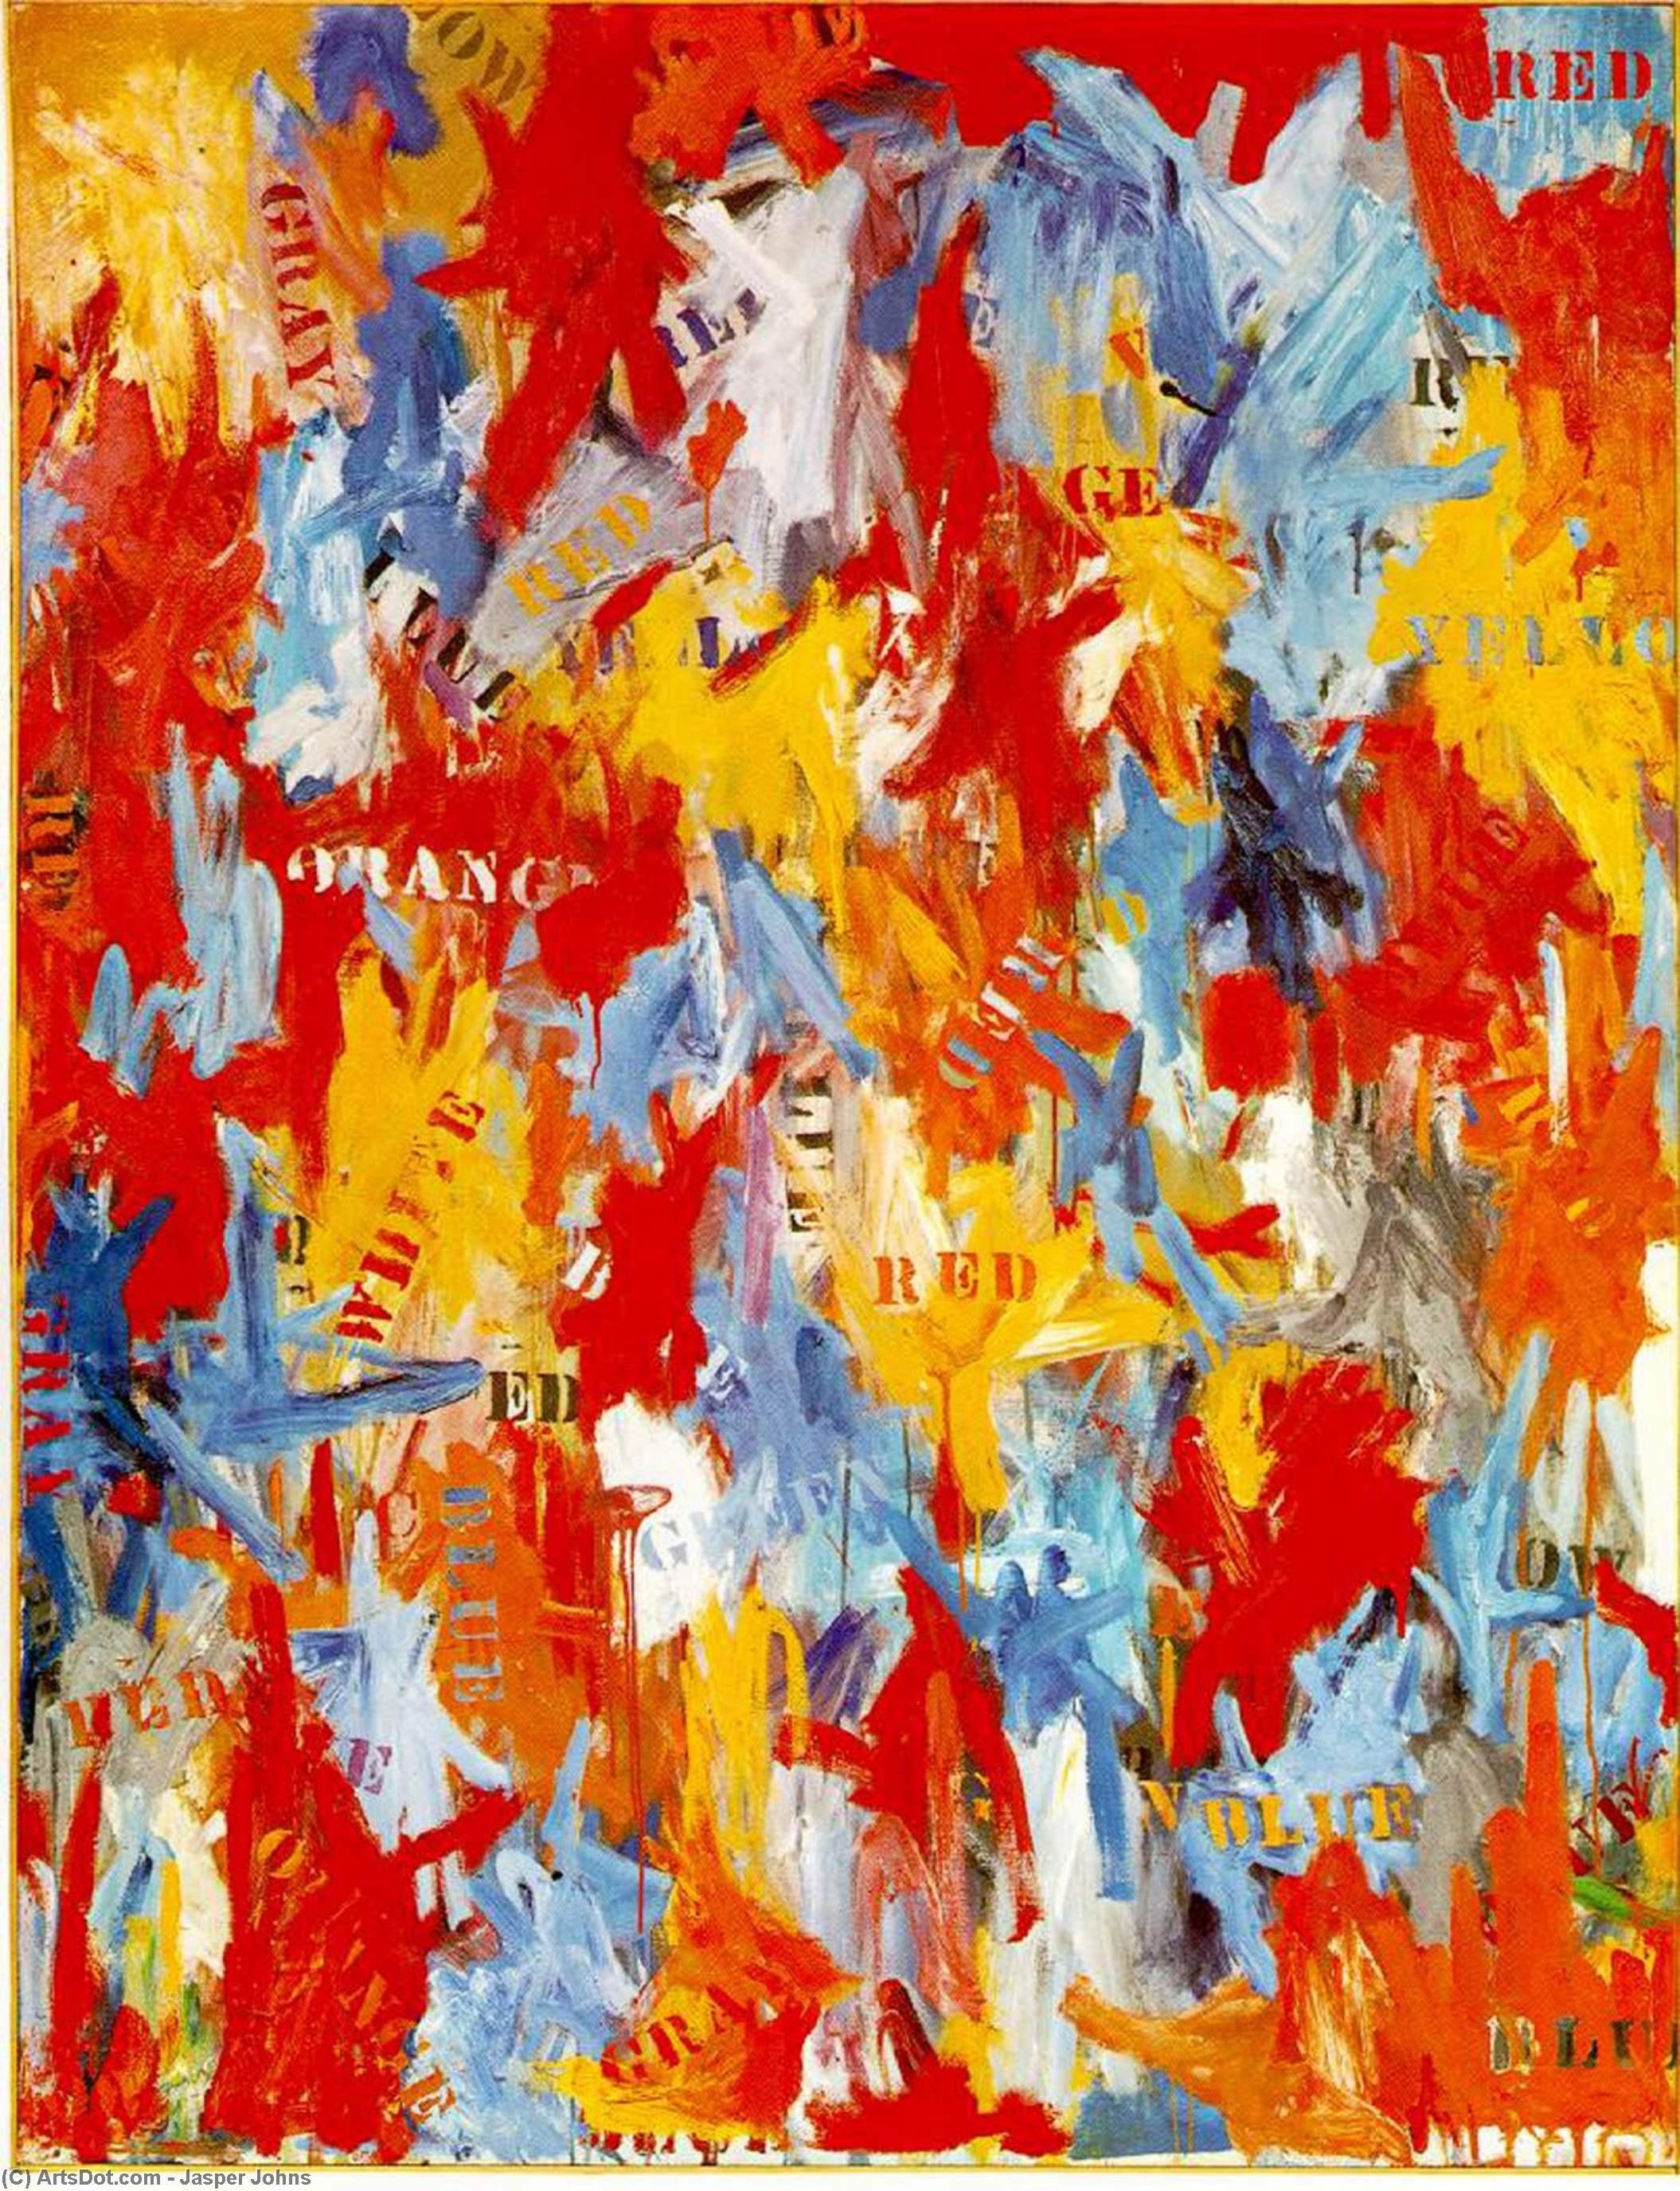 Wikioo.org - The Encyclopedia of Fine Arts - Painting, Artwork by Jasper Johns - False Start